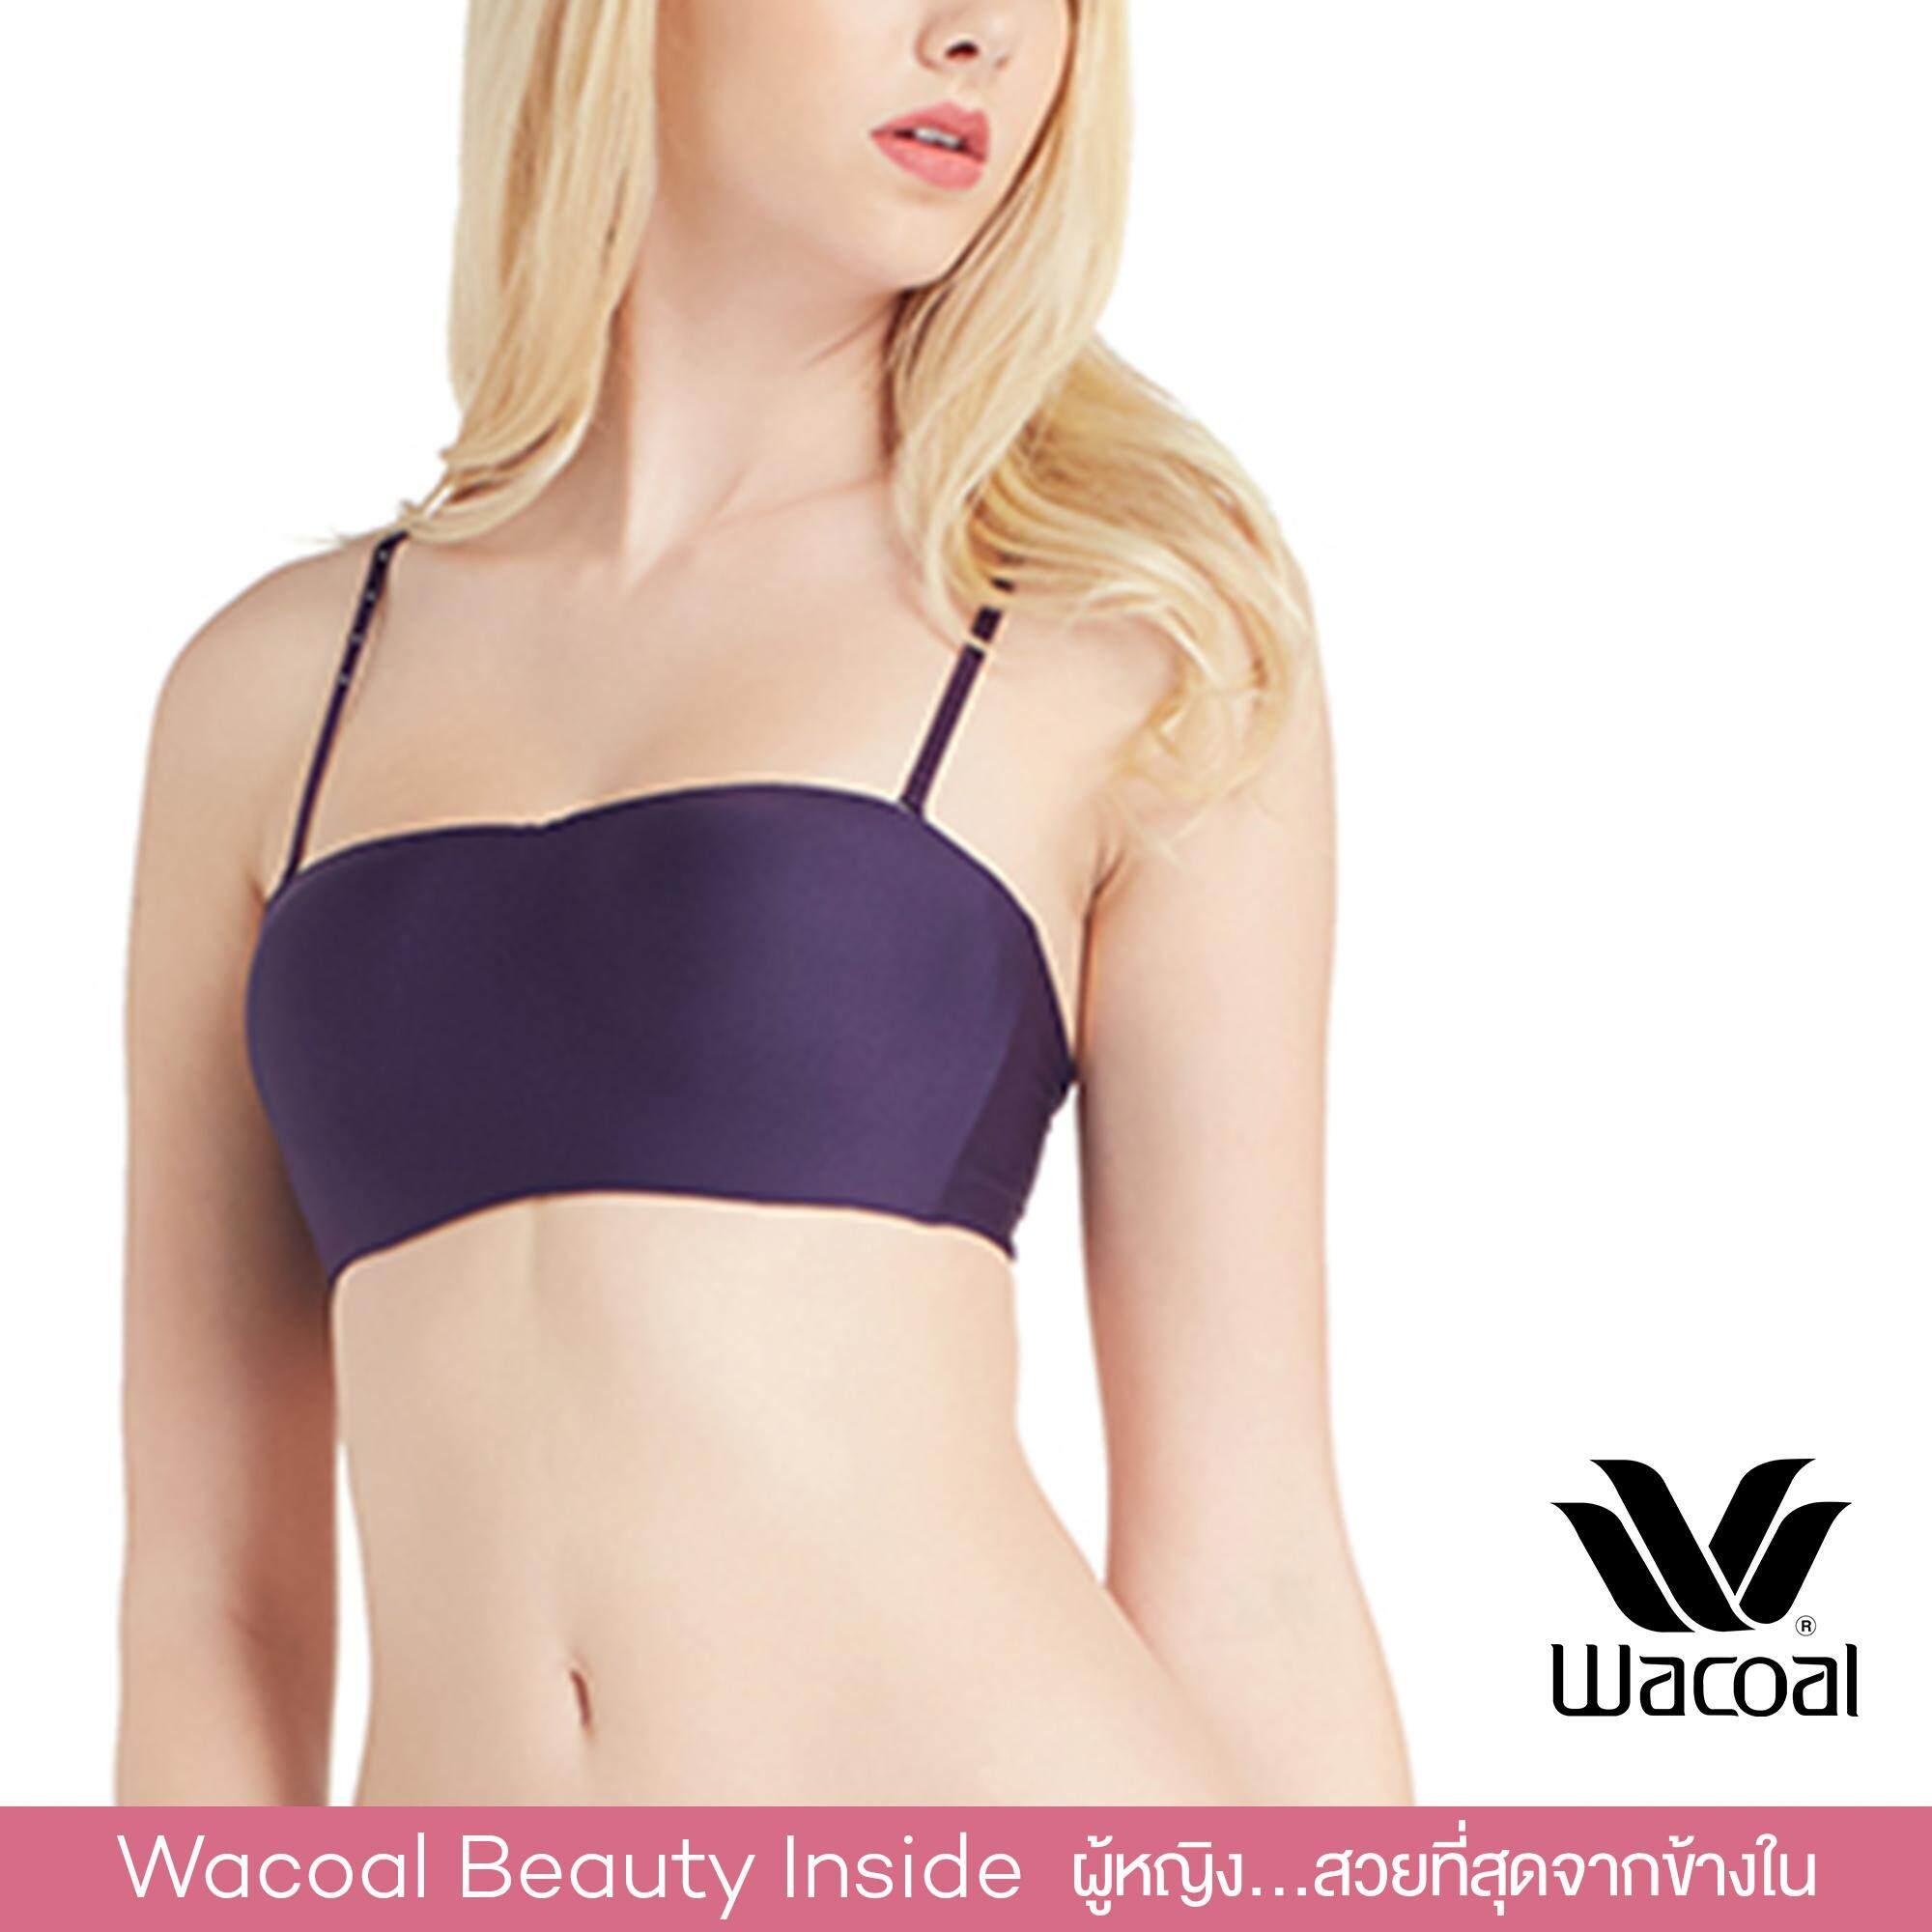 Wacoal Best Seller บราเกาะอก 1/2 cup (สีม่วงแดง/VIOLET) -WB3B53VI